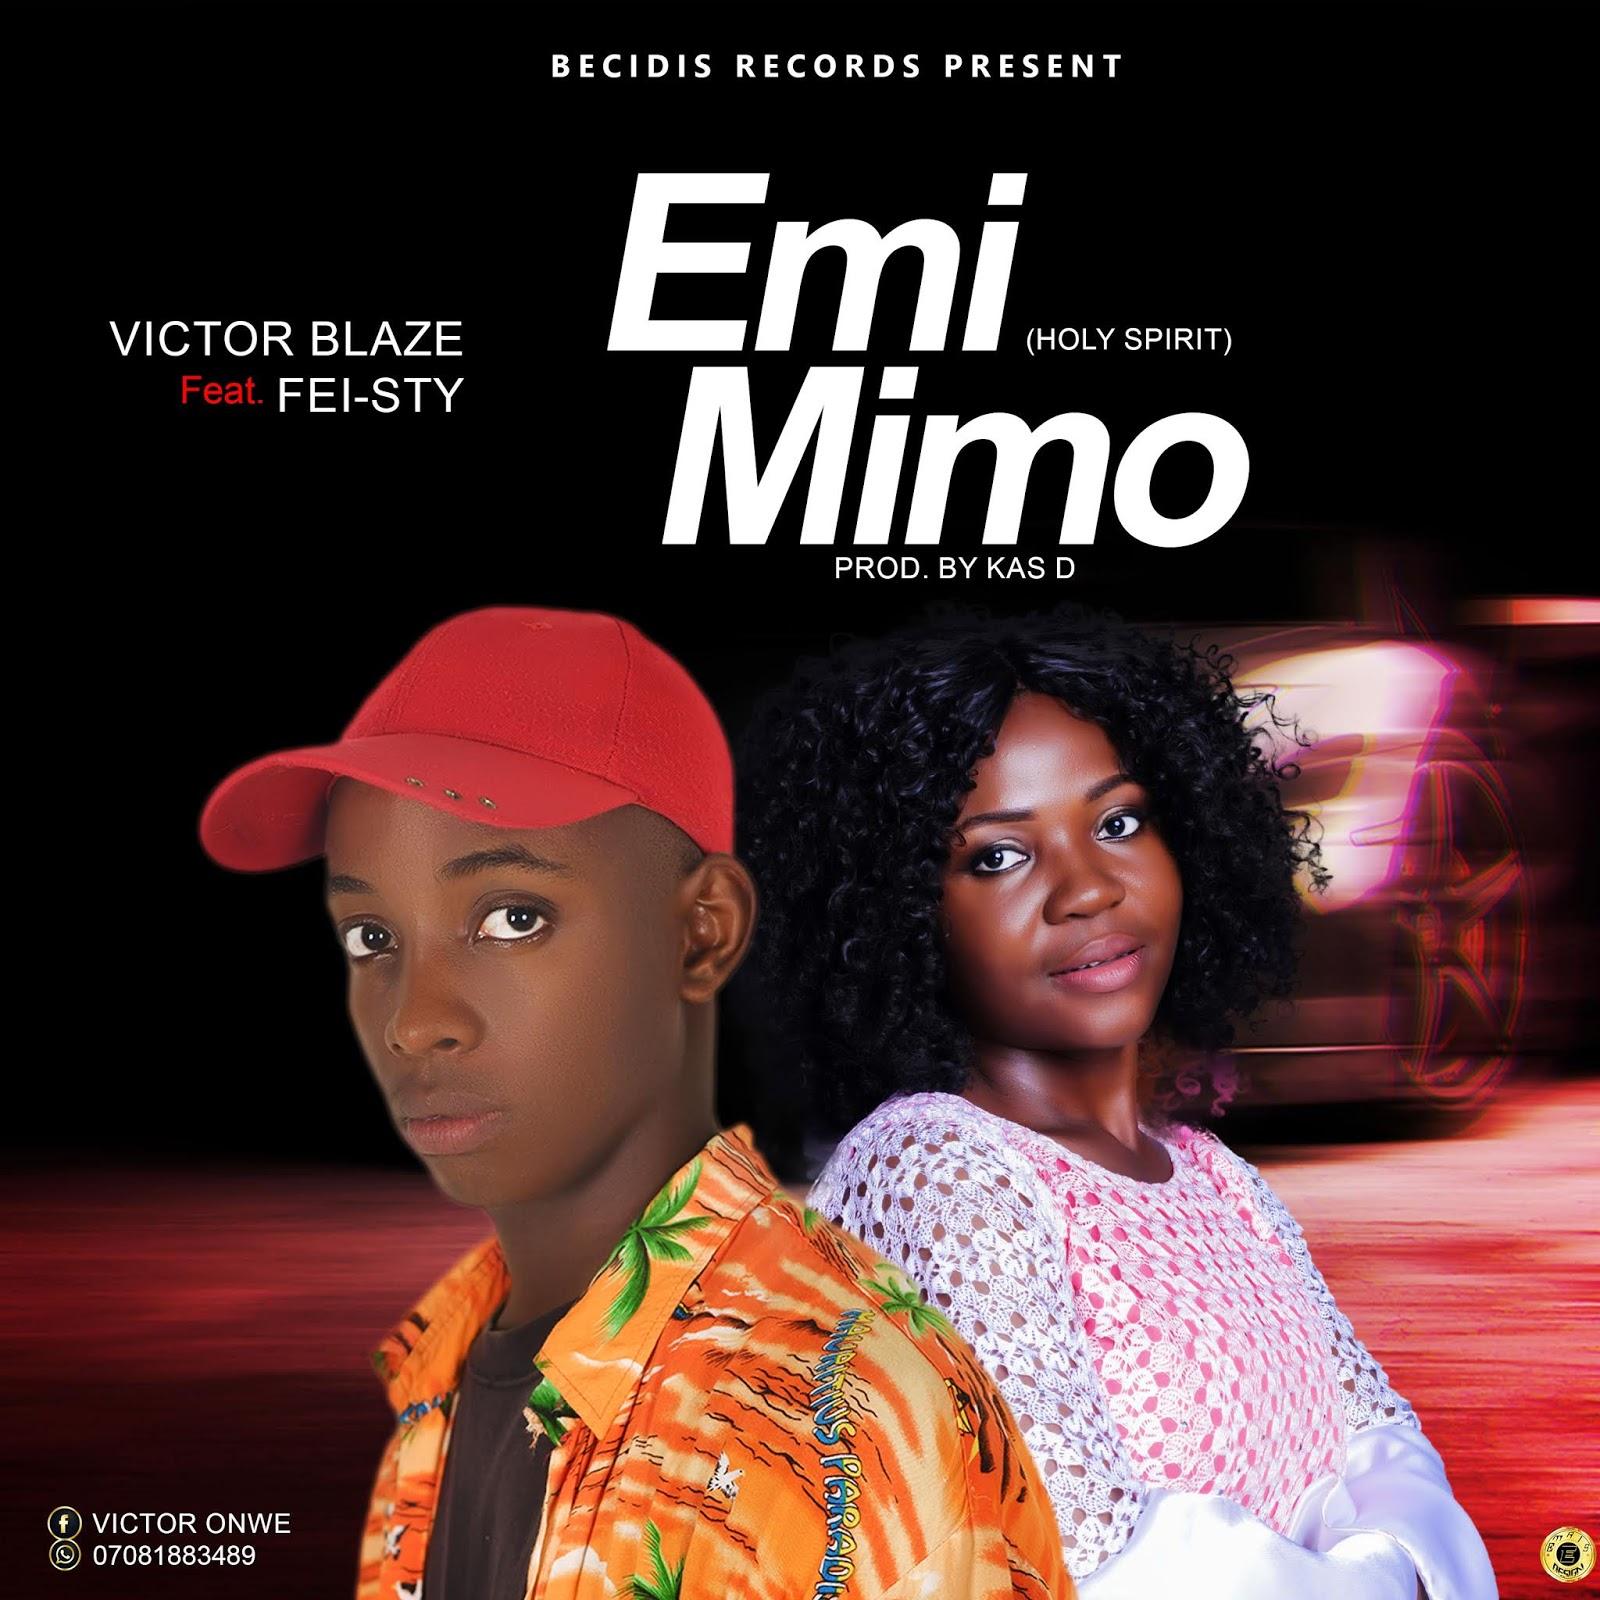 Victor Blaze Ft Fei-sty – Emi Mimo